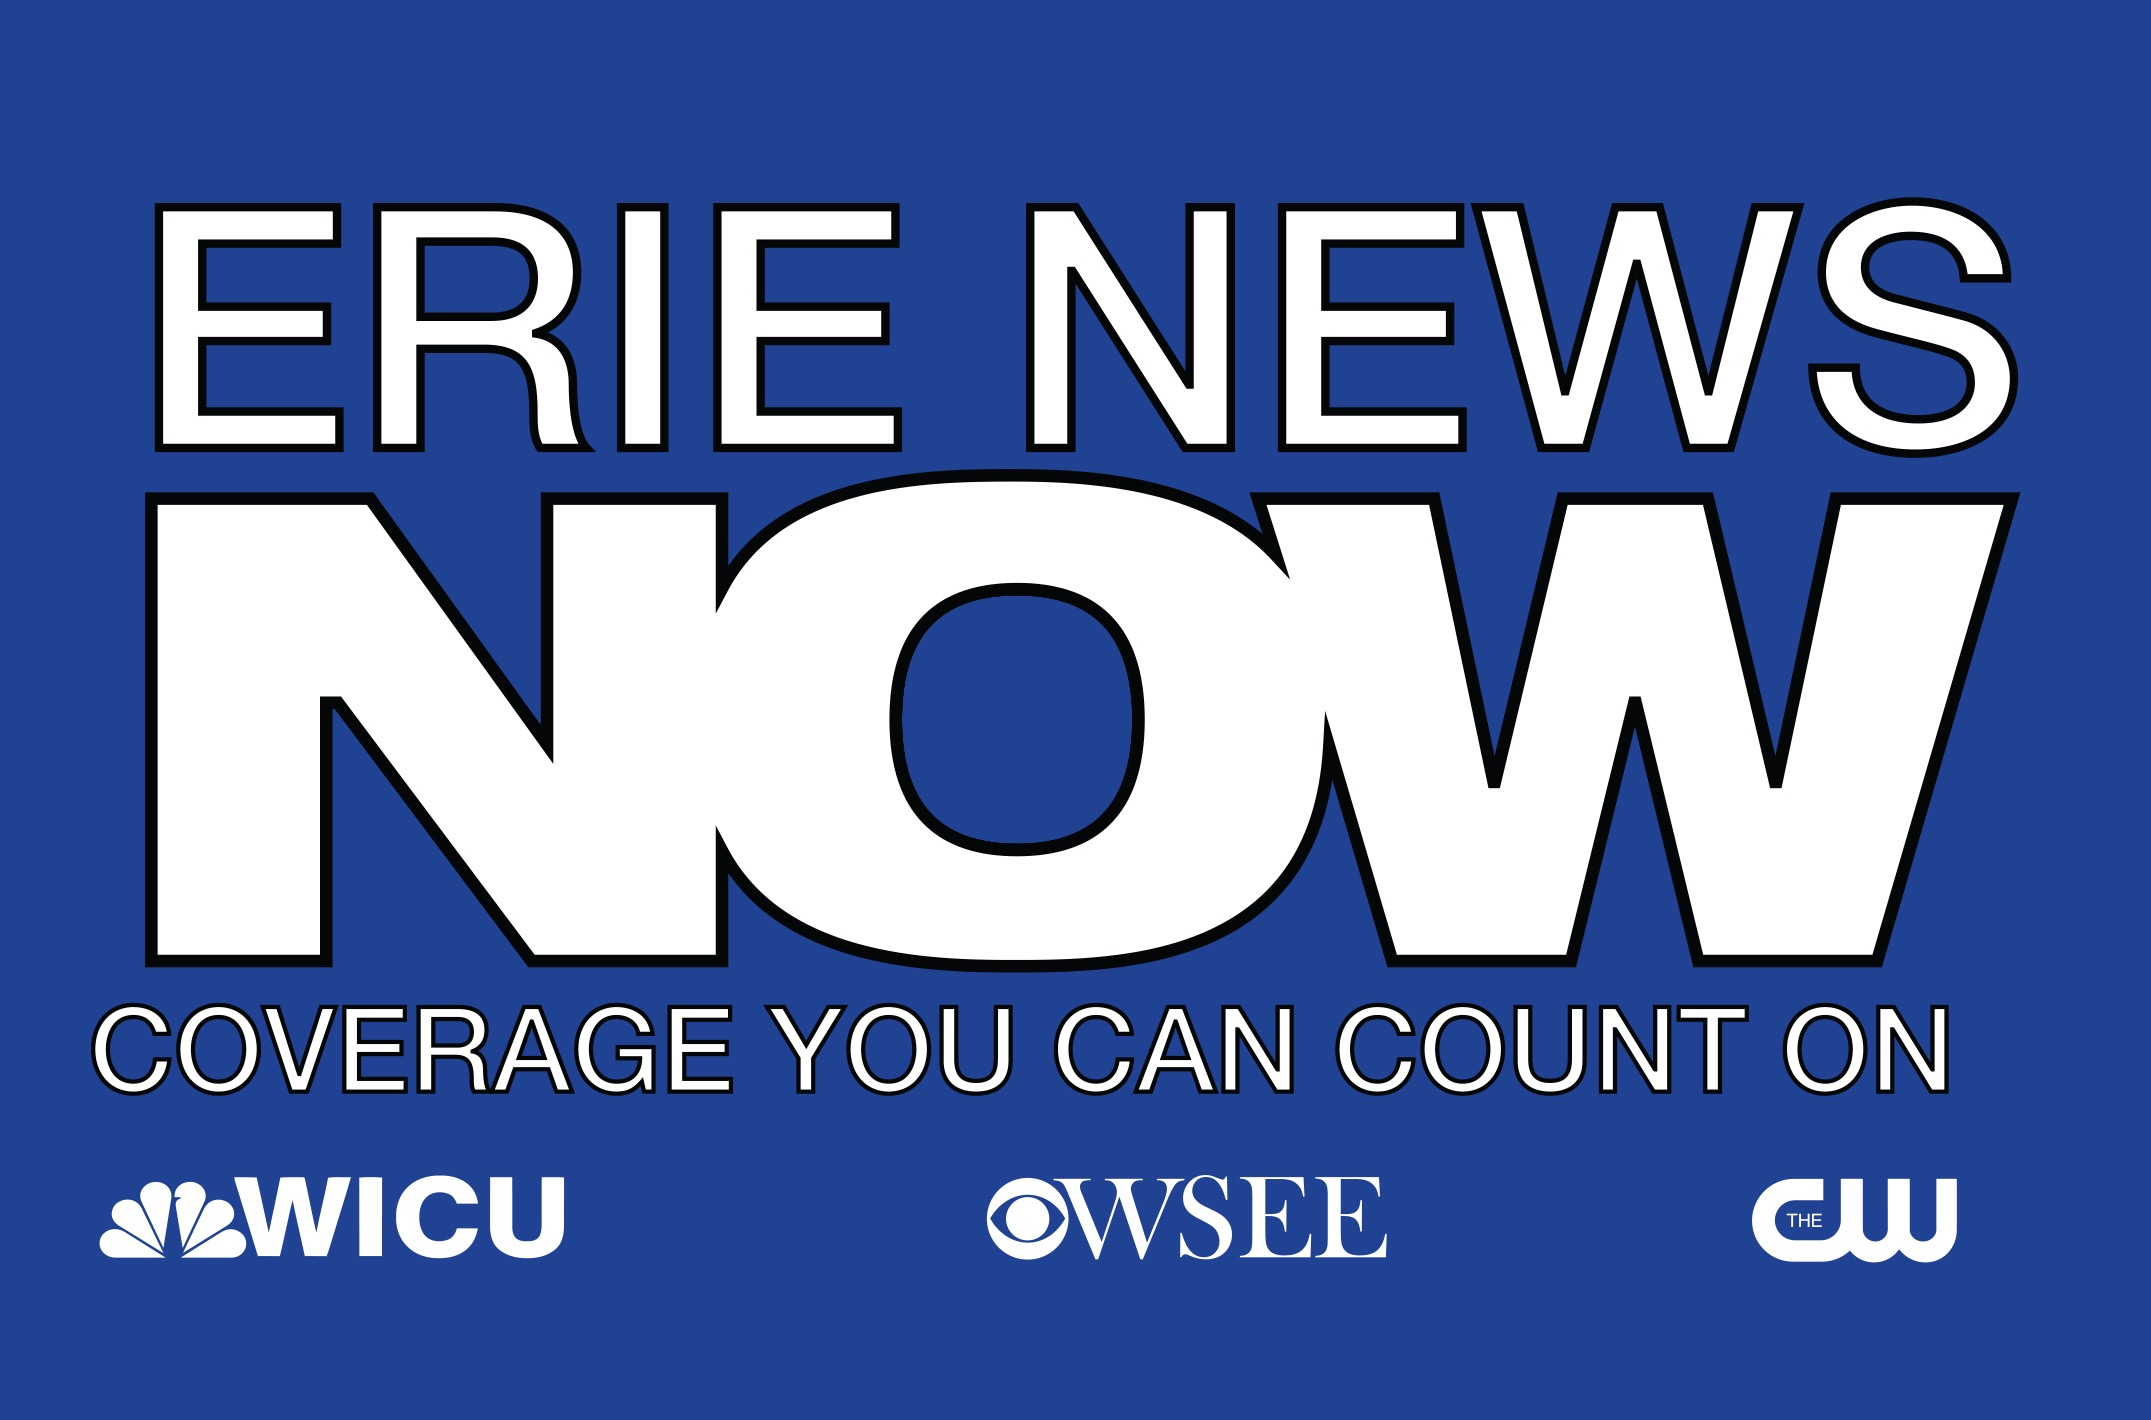 ErieNewsNow.jpg